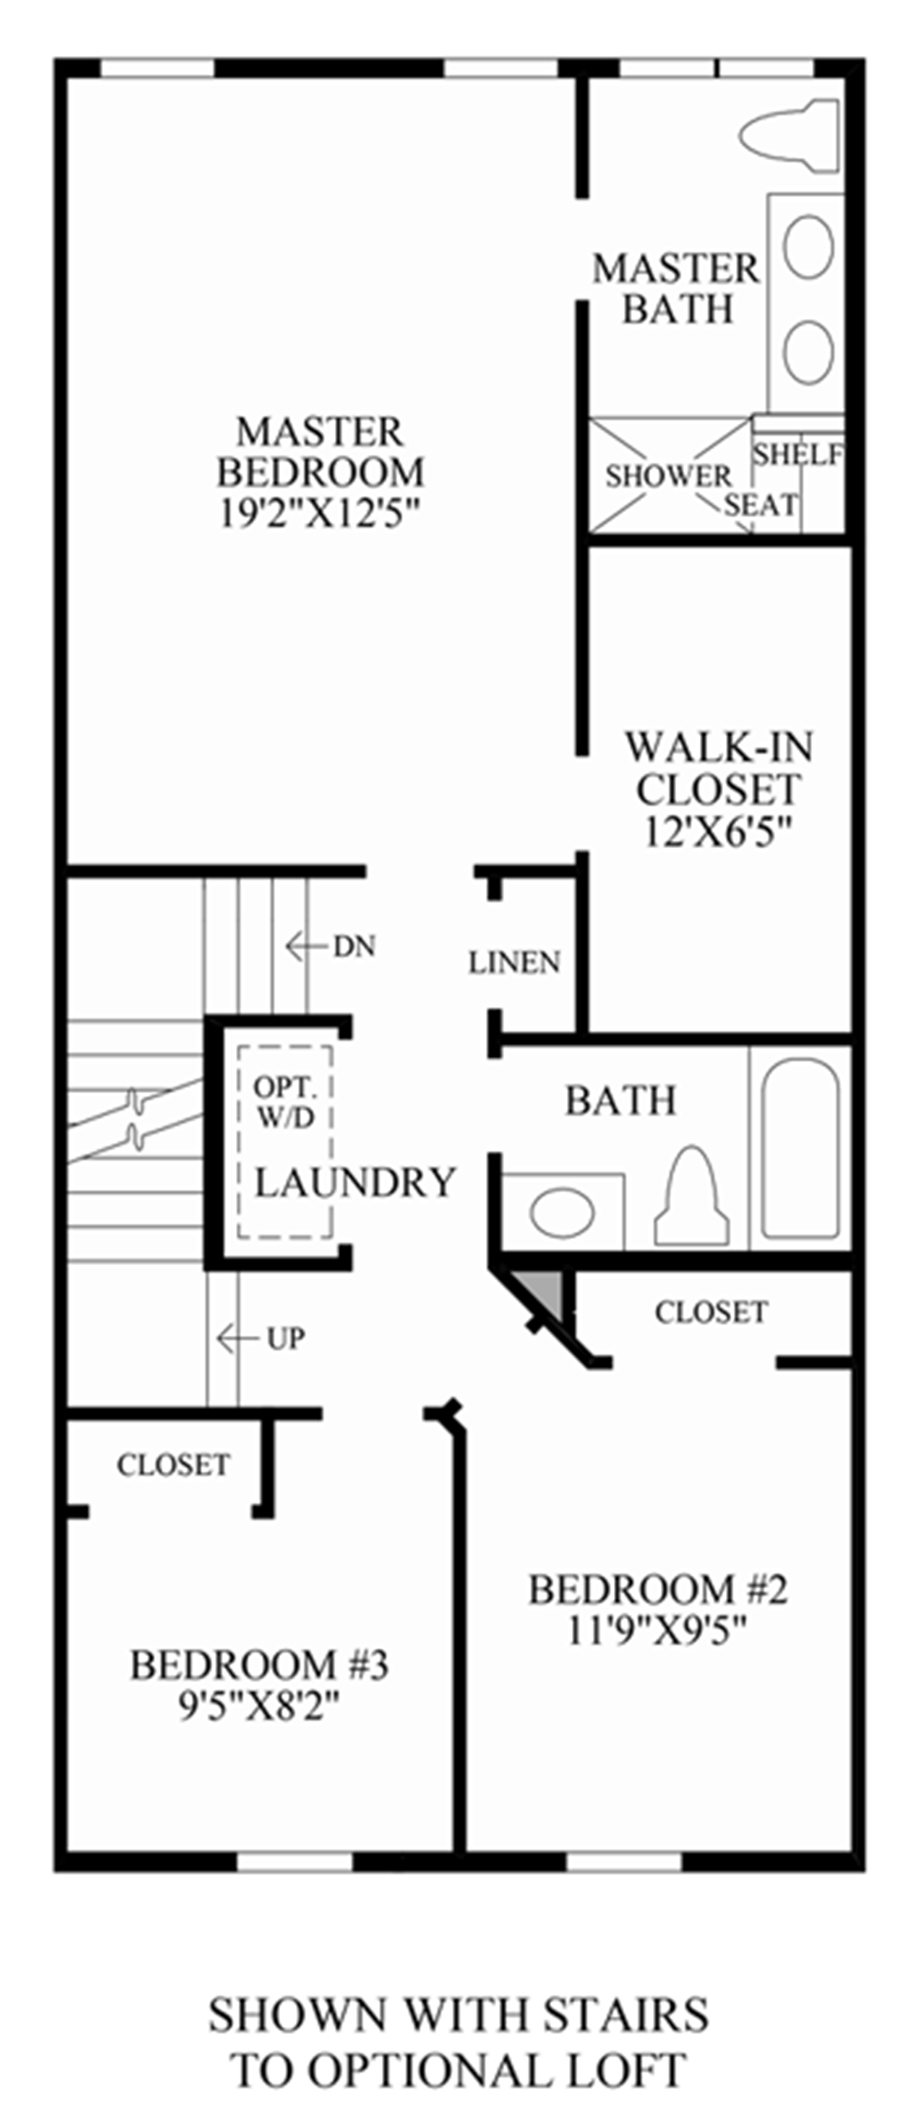 Stairs to Optional Loft Floor Plan